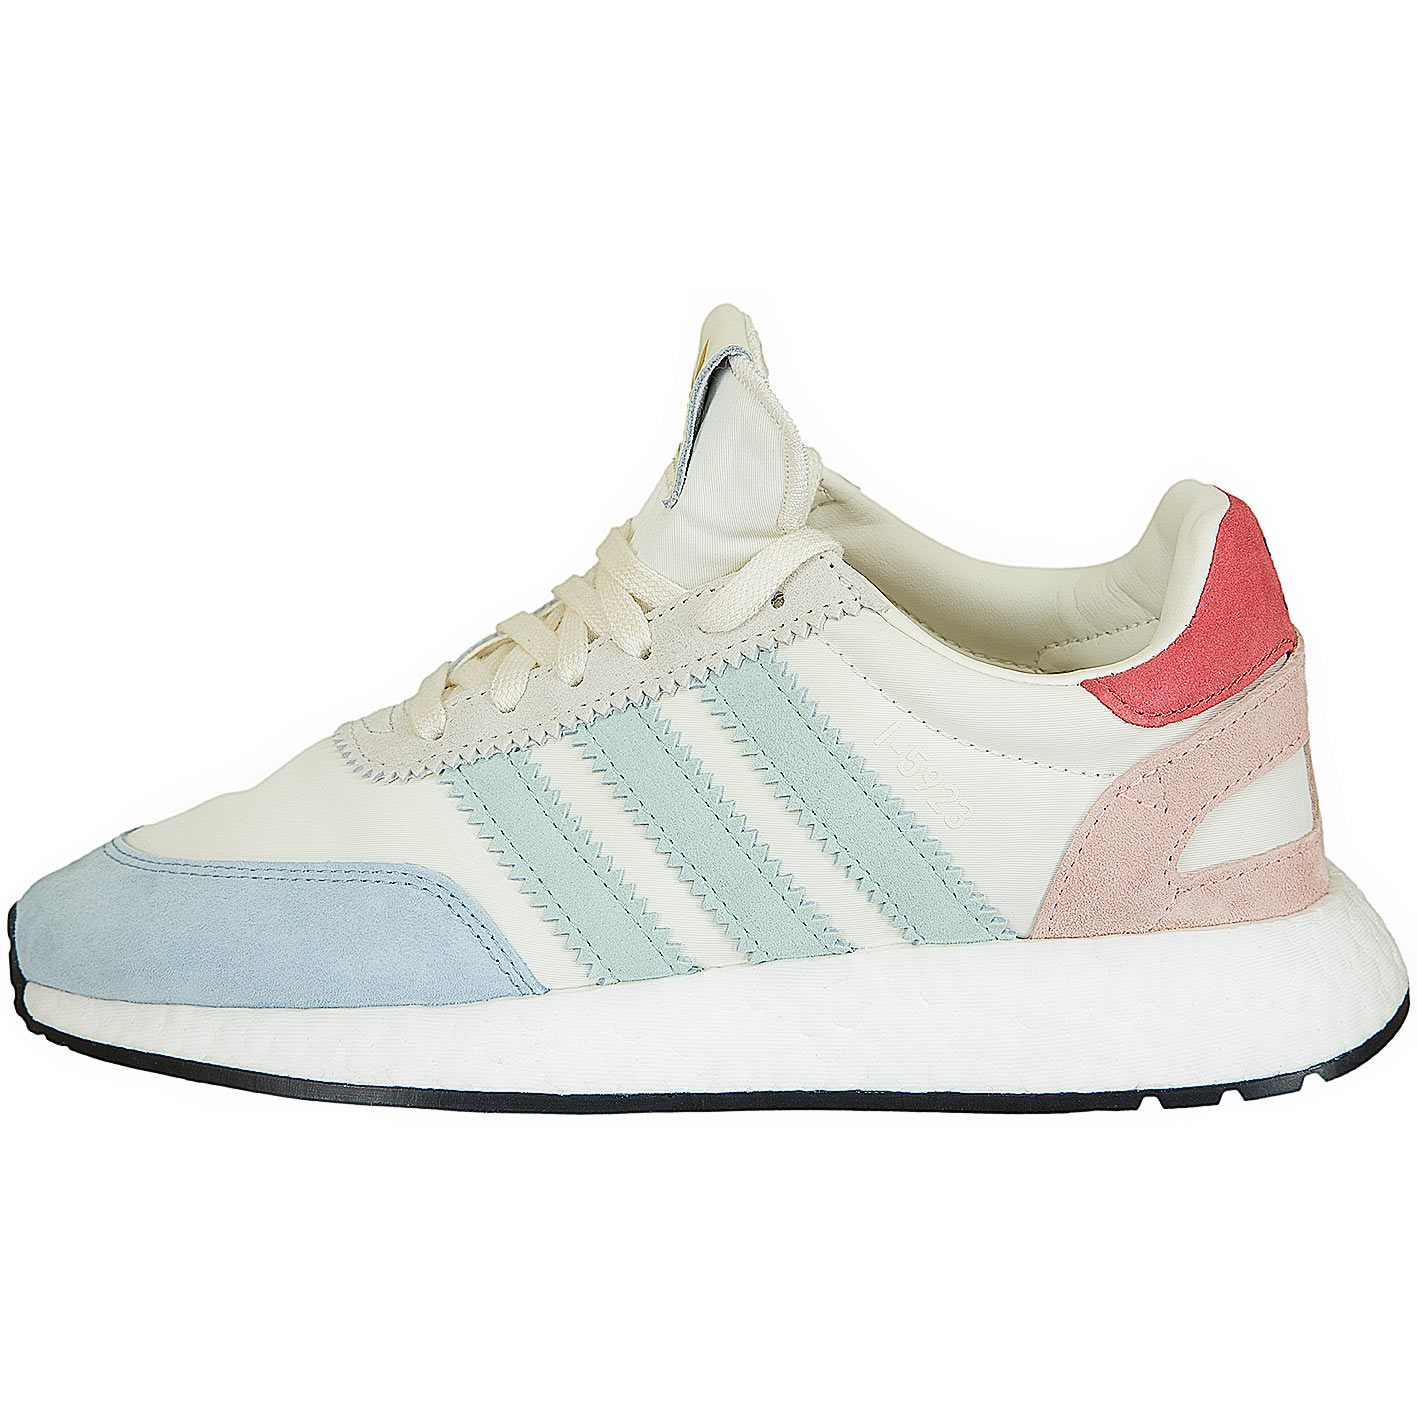 76edccb4487bde ☆ Adidas Originals Damen Sneaker I-5923 Pride beige hellblau rot ...